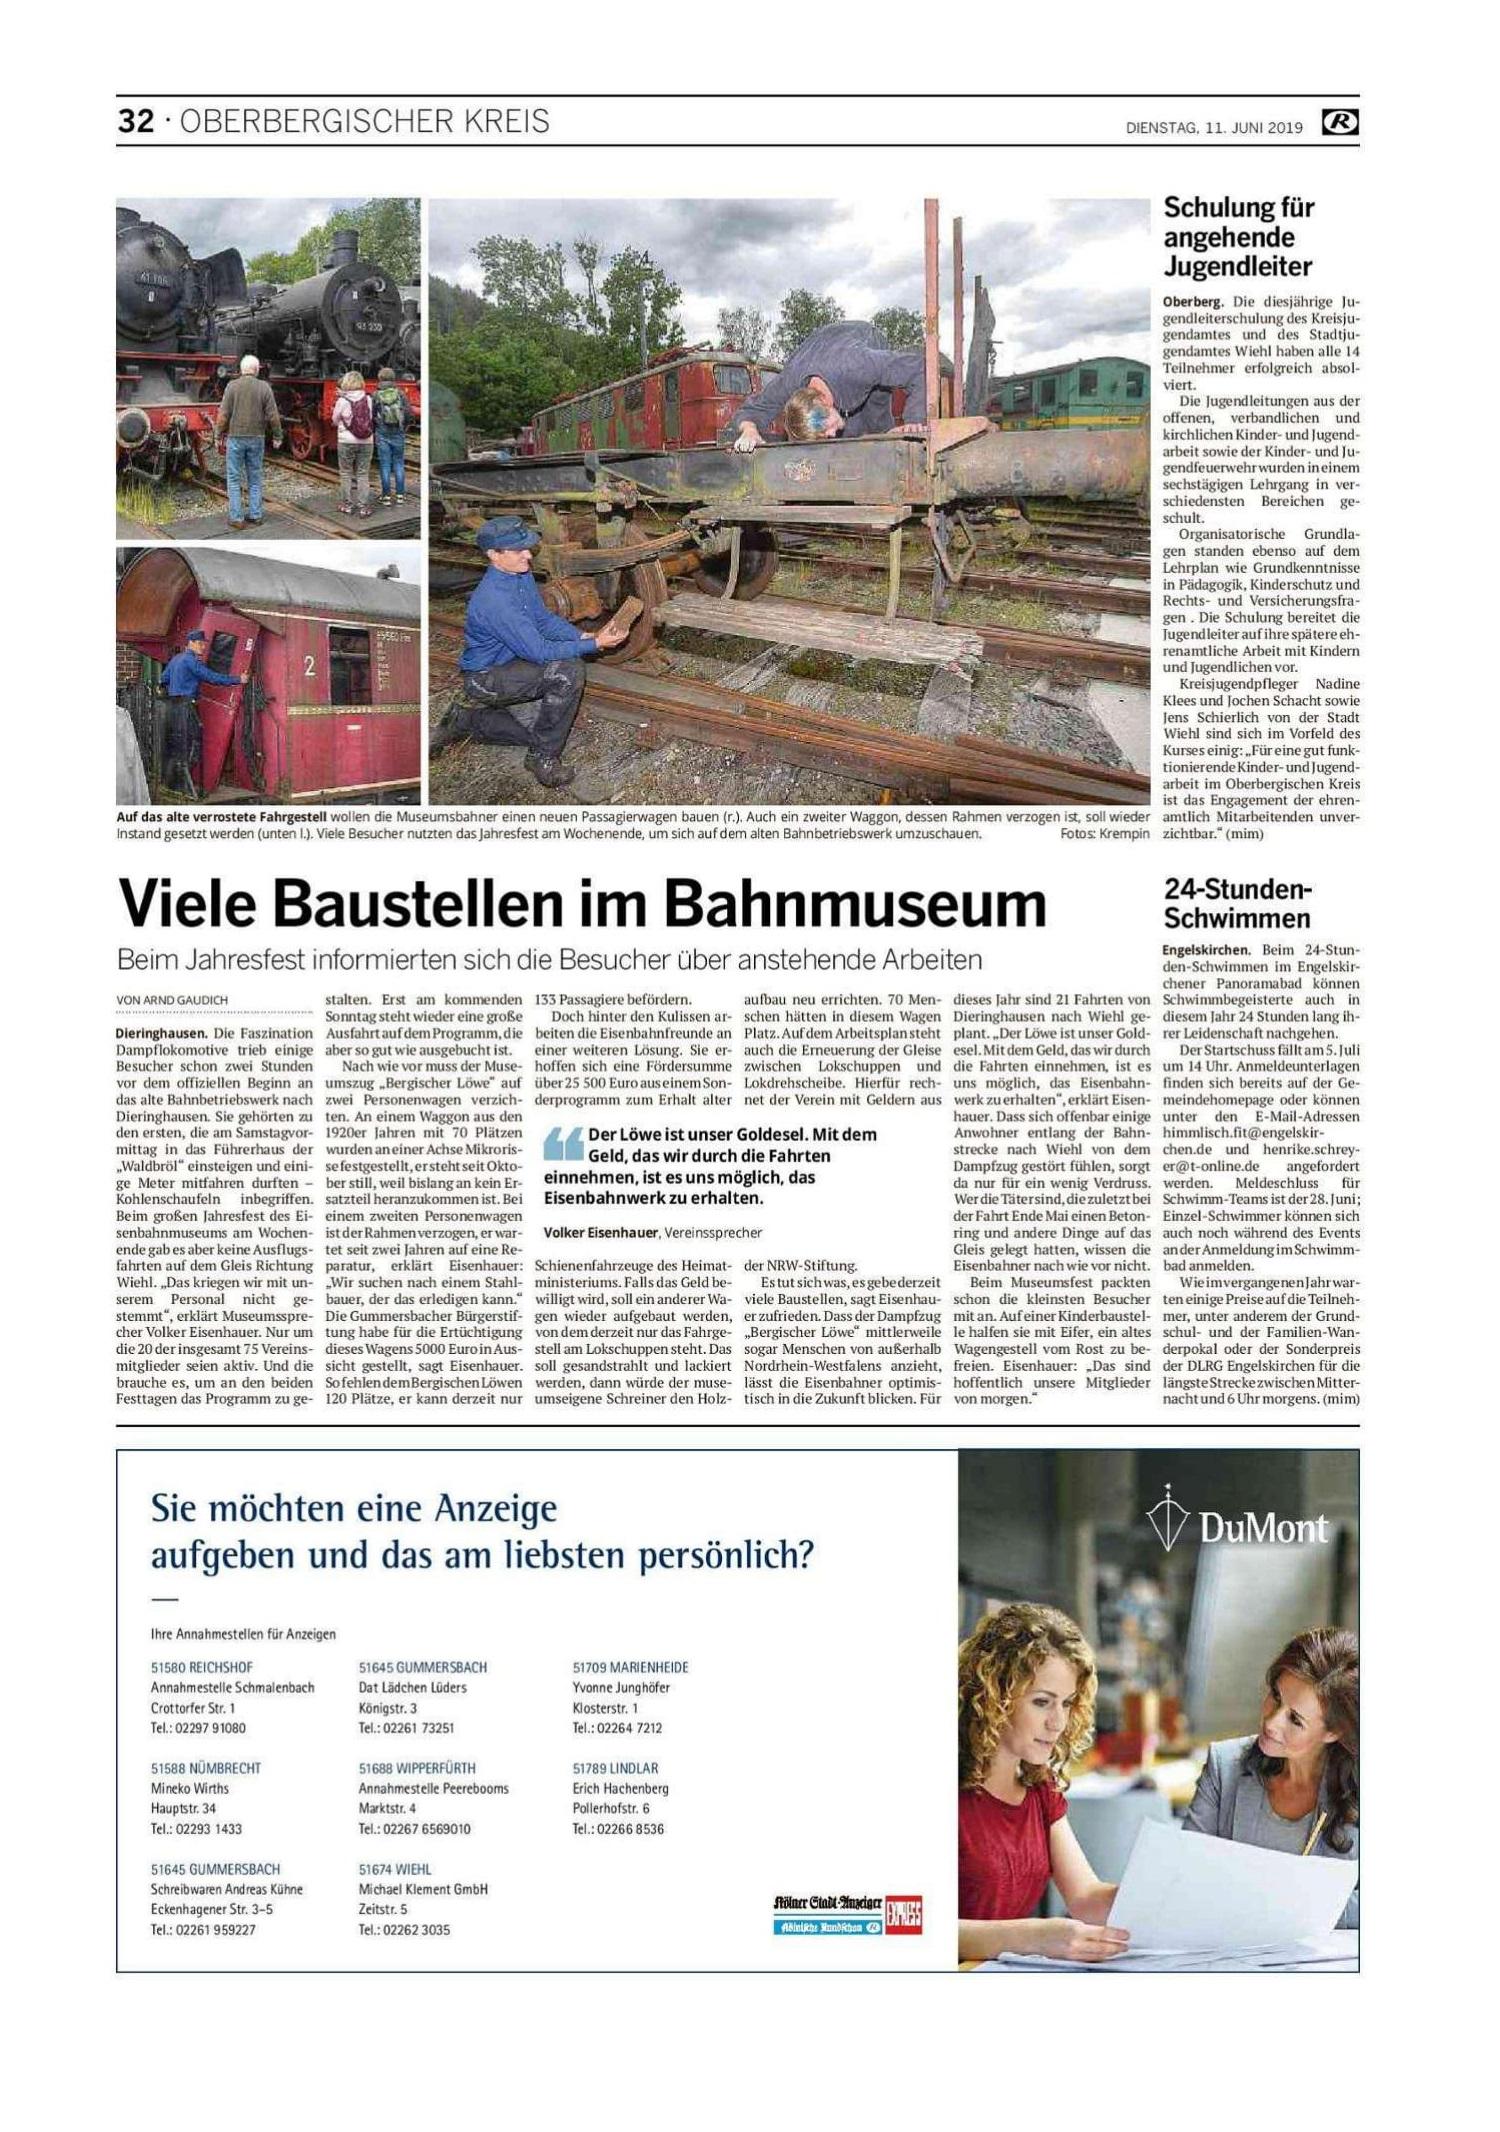 Viele Baustellen im Bahnmuseum